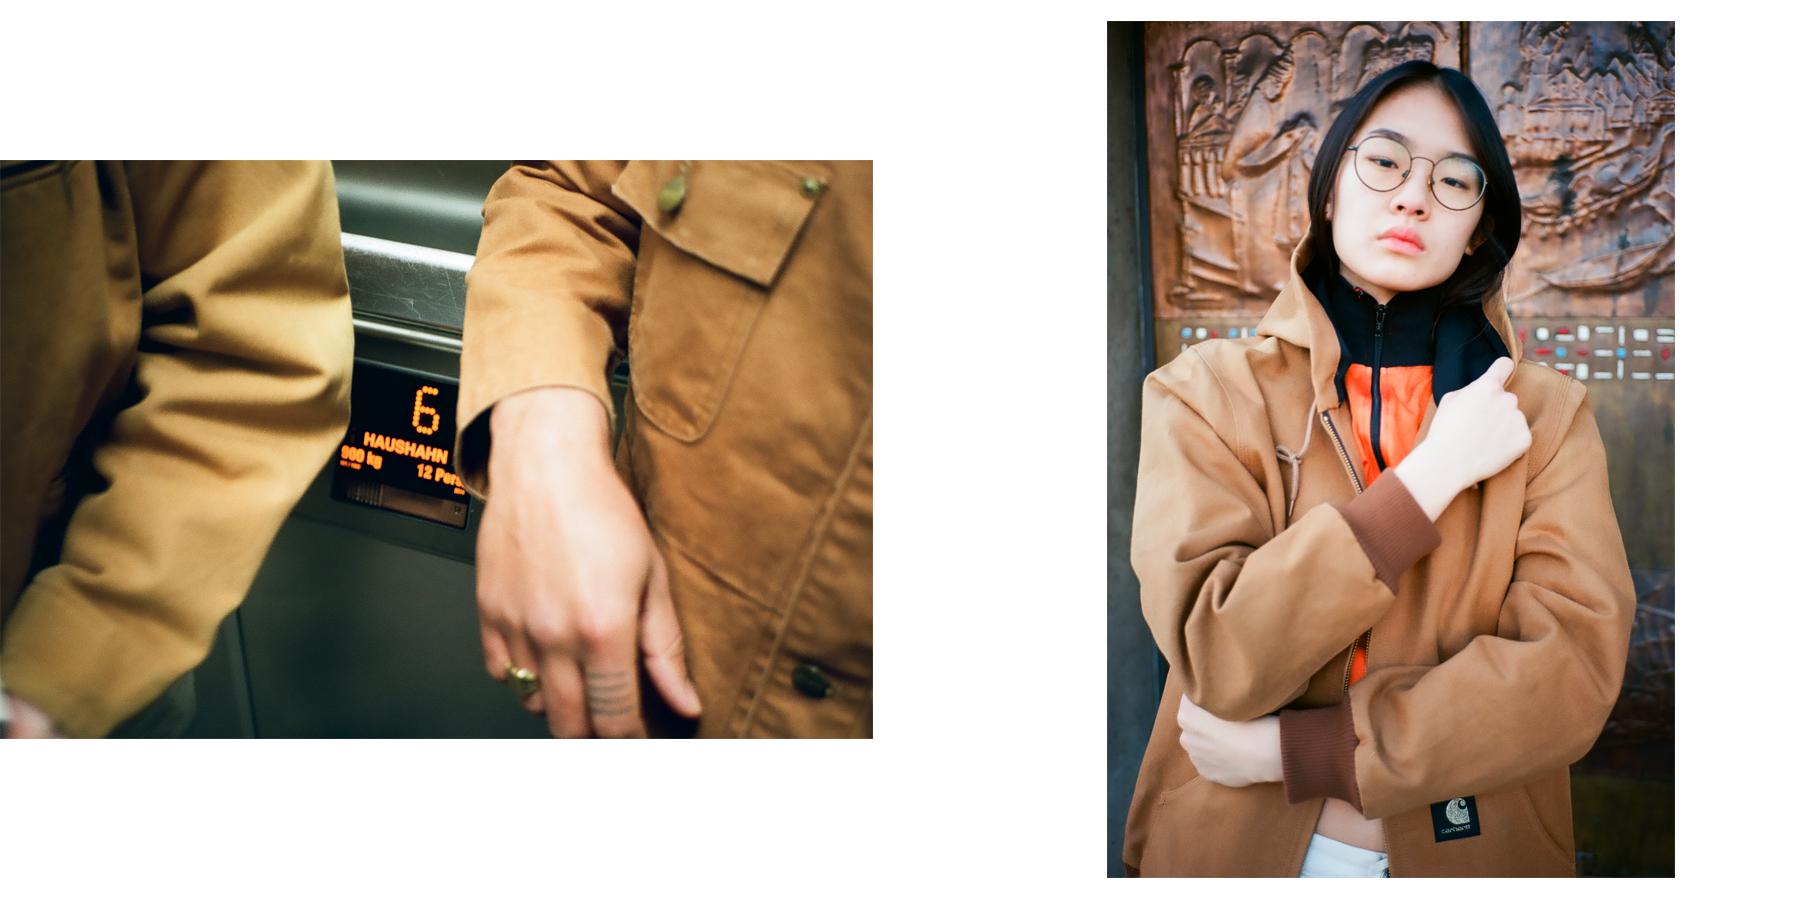 BEINGHUNTED. Carhartt WIP The Essence of Progress - Mobilegirl, Mastermind Japan